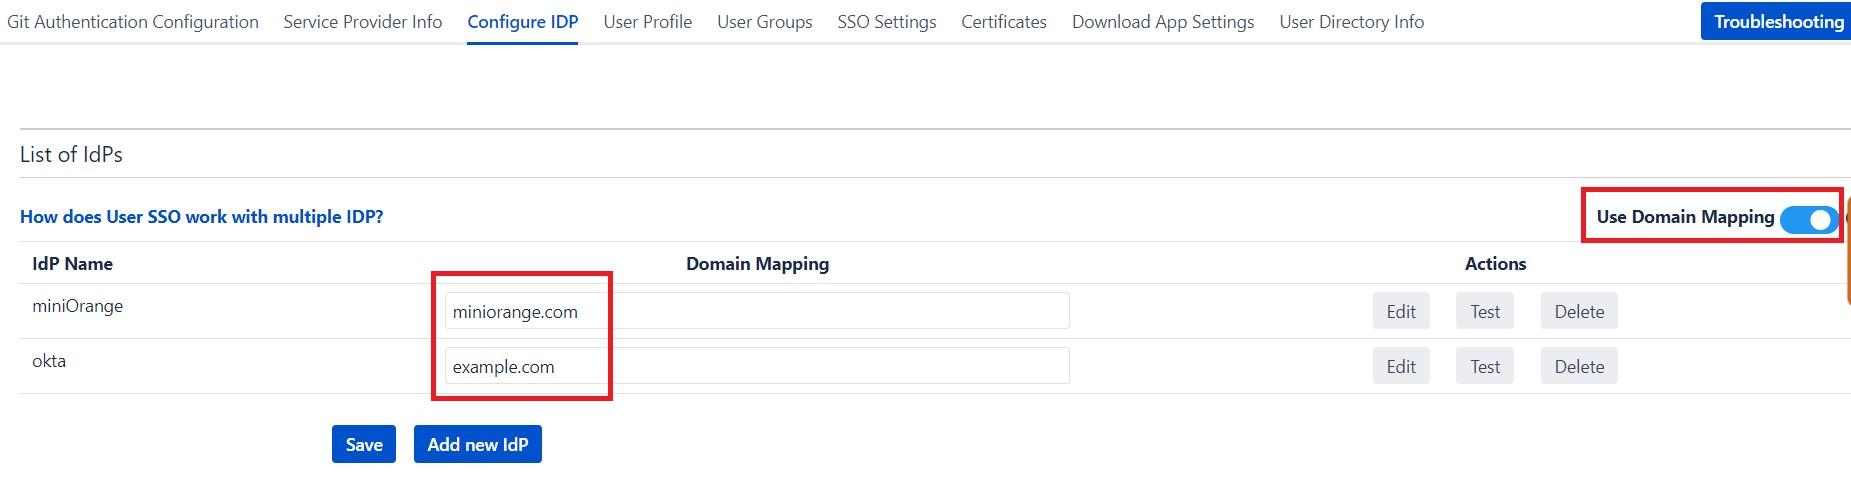 SAML Single Sign On (SSO) into Bitbucket Service Provider, Domain Mapping Configuration